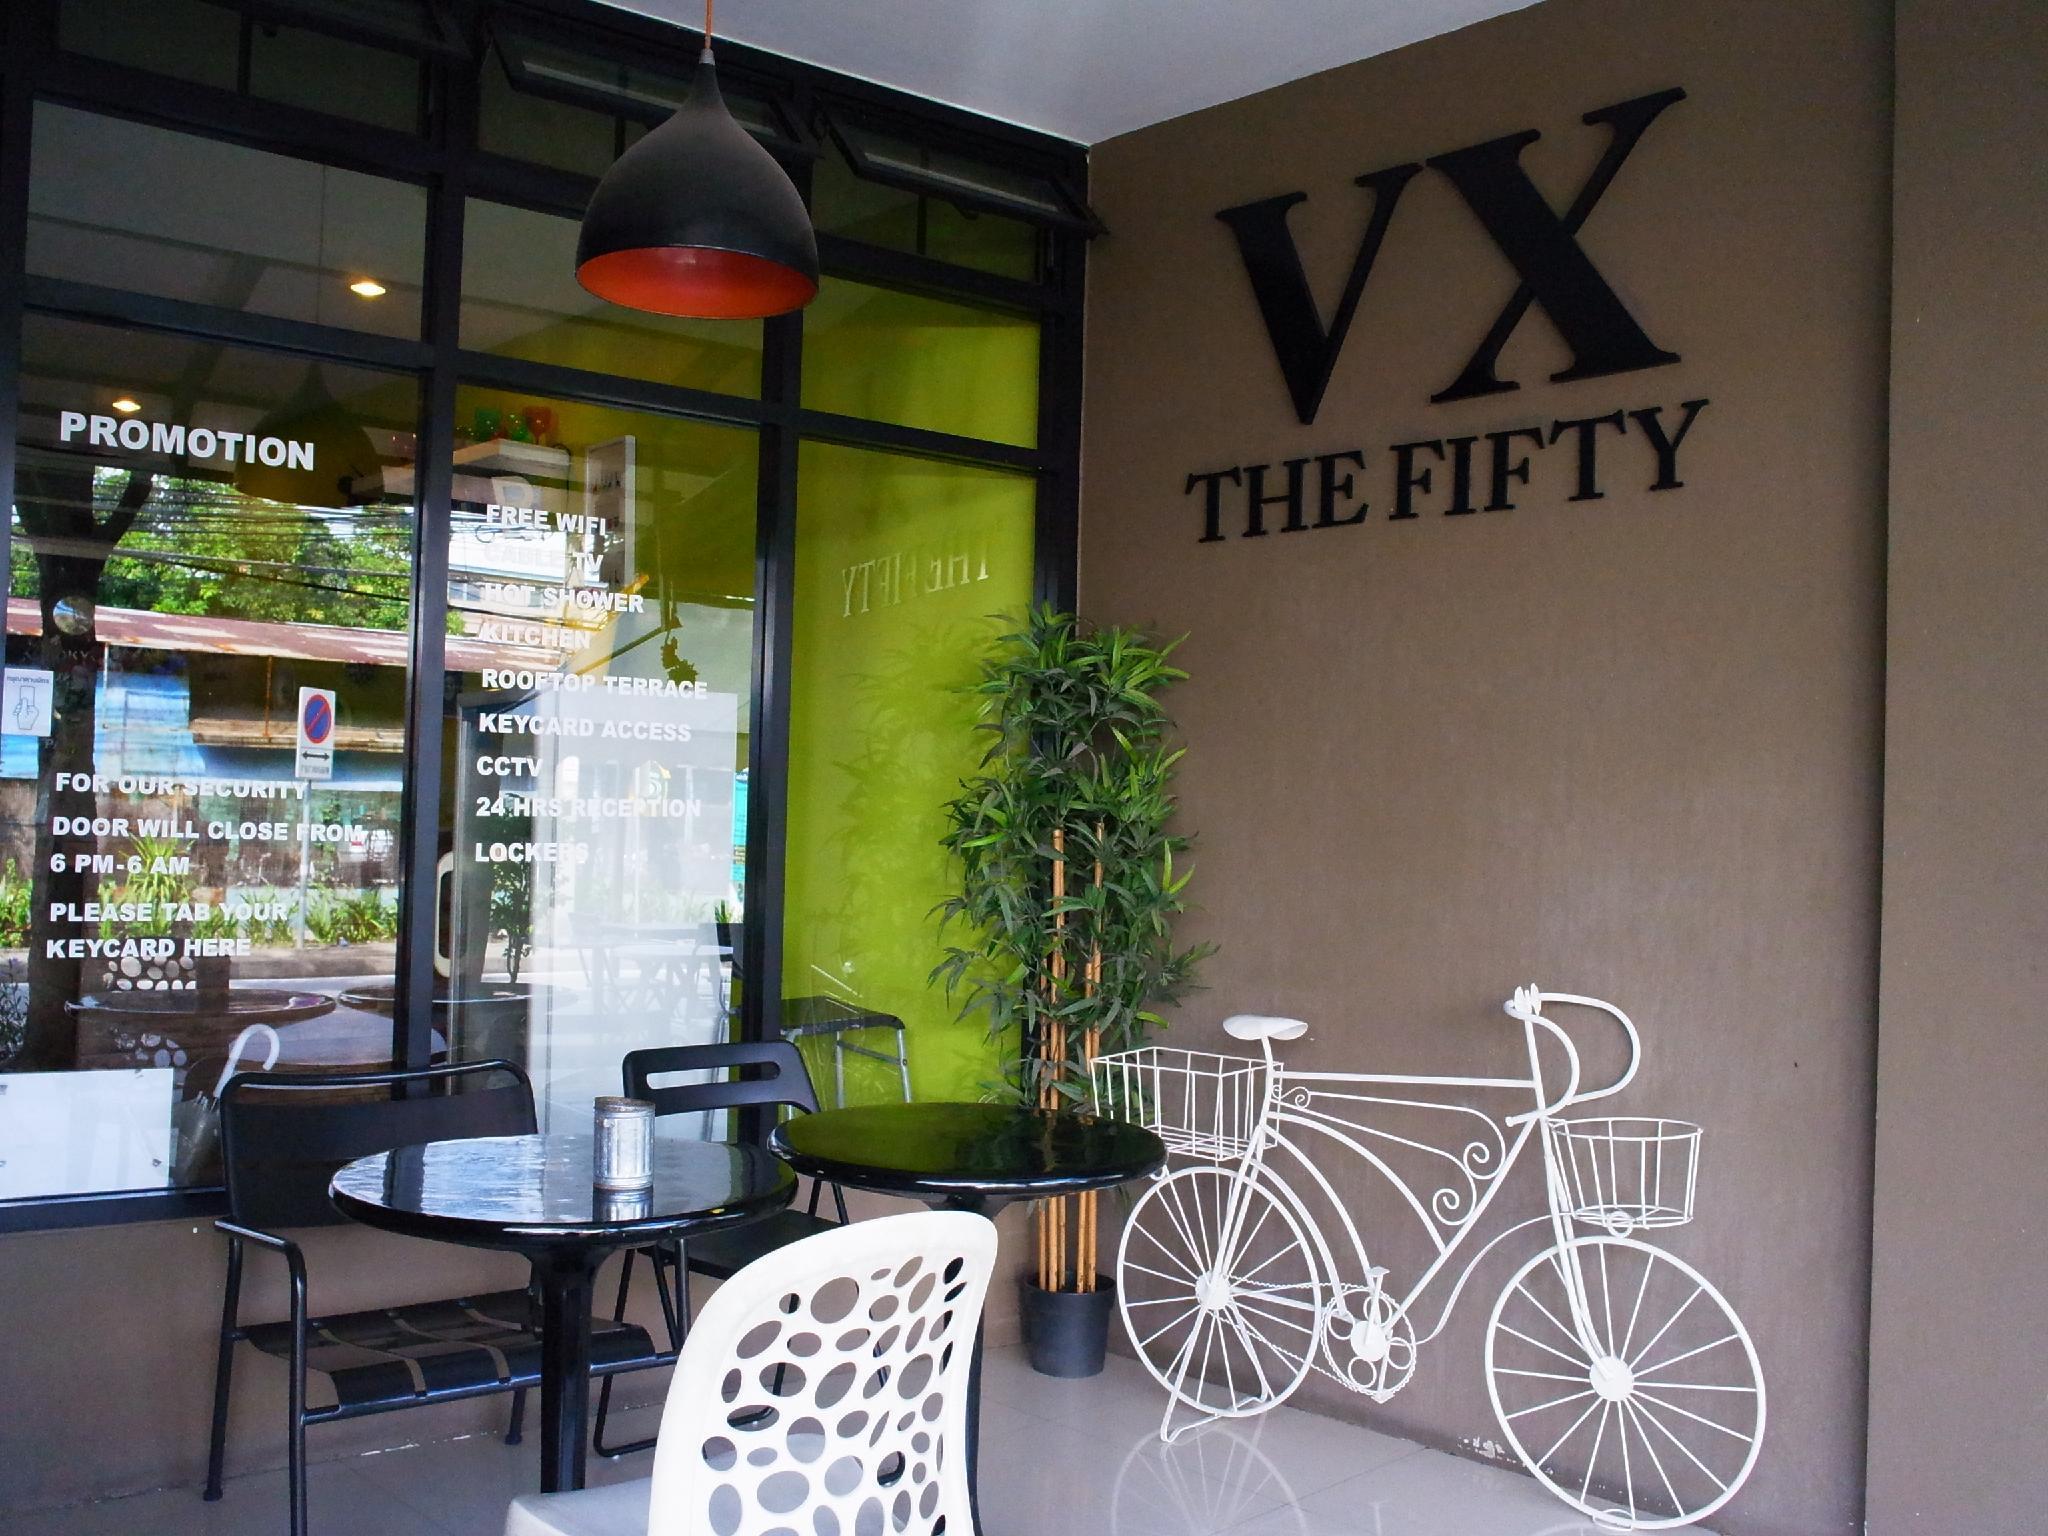 Vx The Fifty Hostel